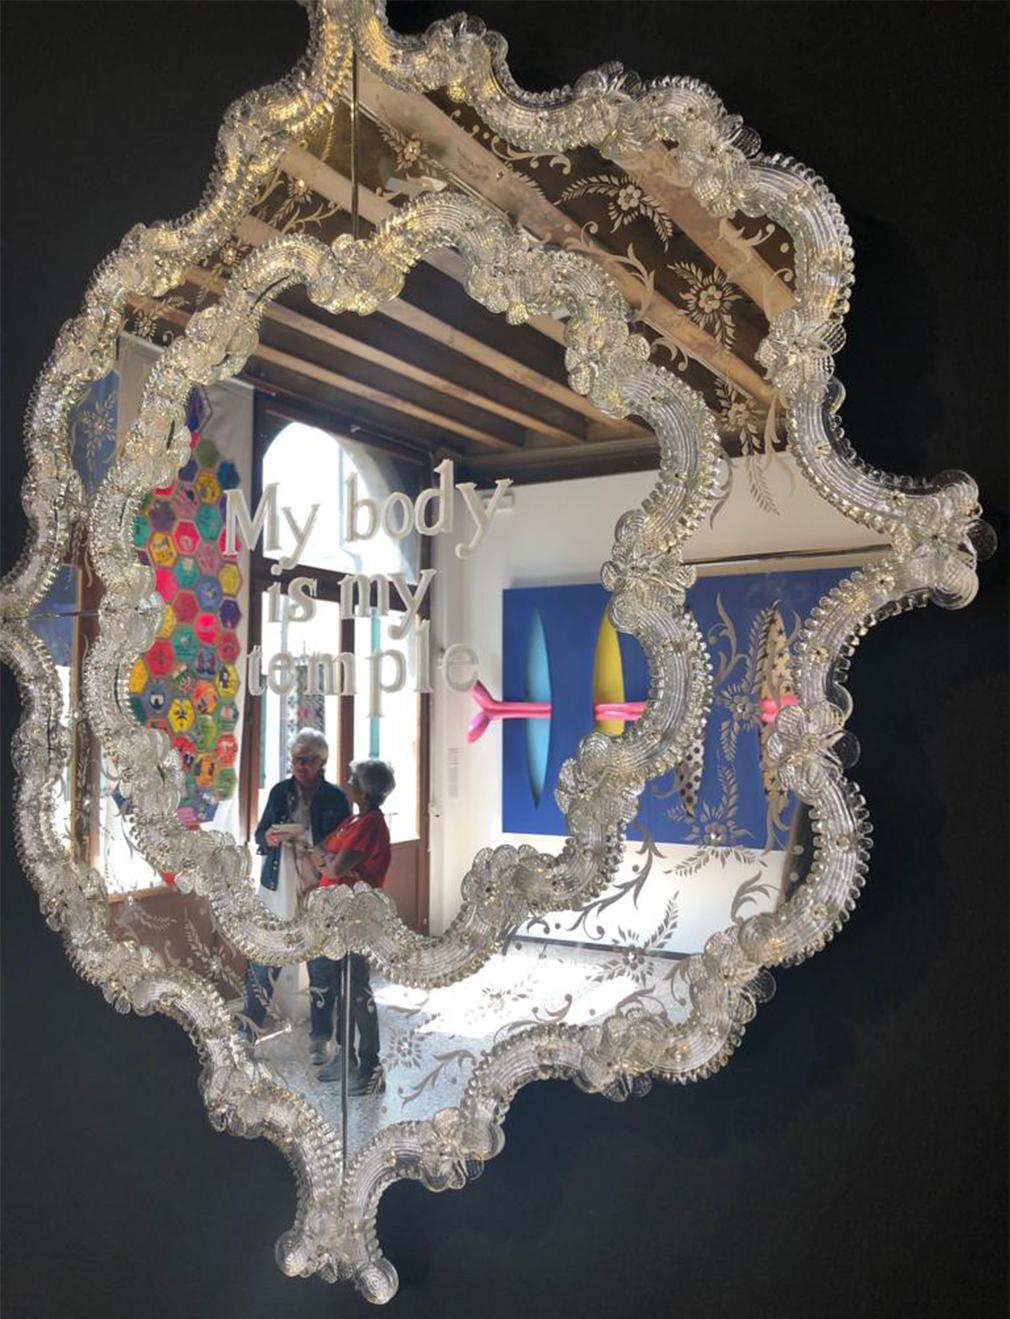 Reflexions-Nina-Dotti-14